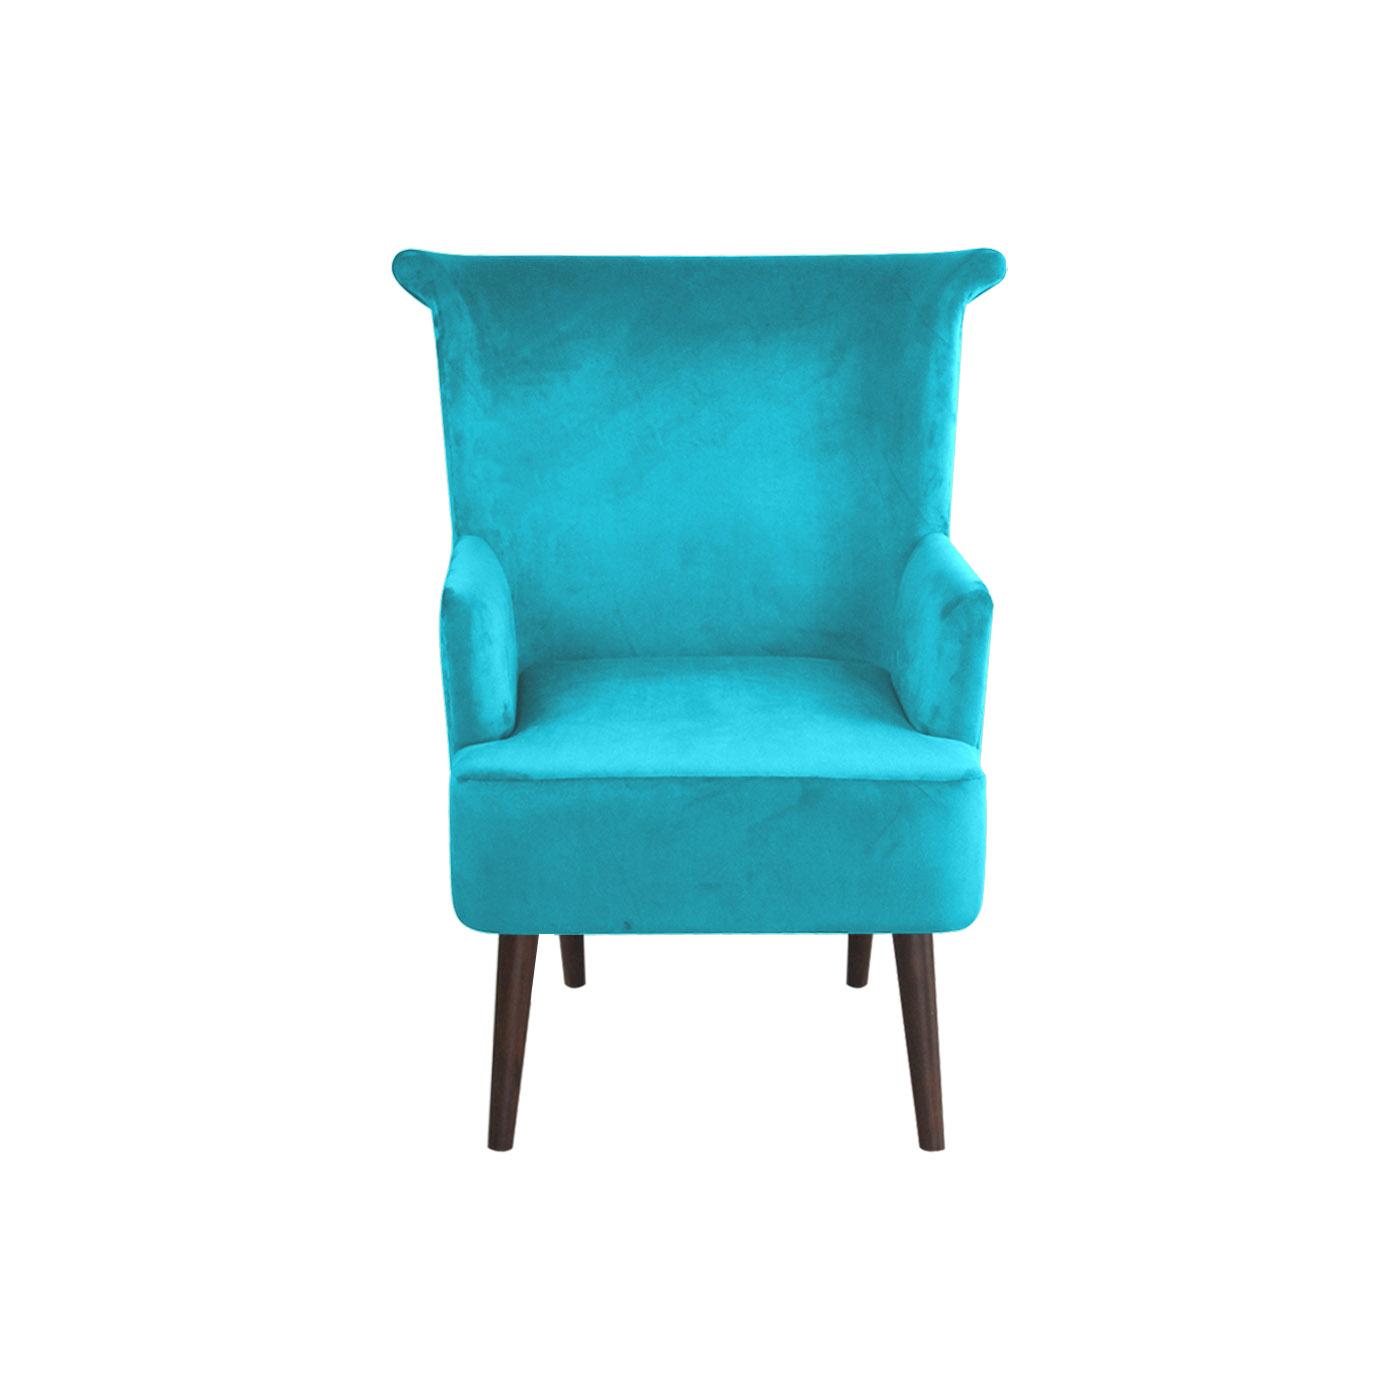 Pompeii Turquoise Dark Arm Chair